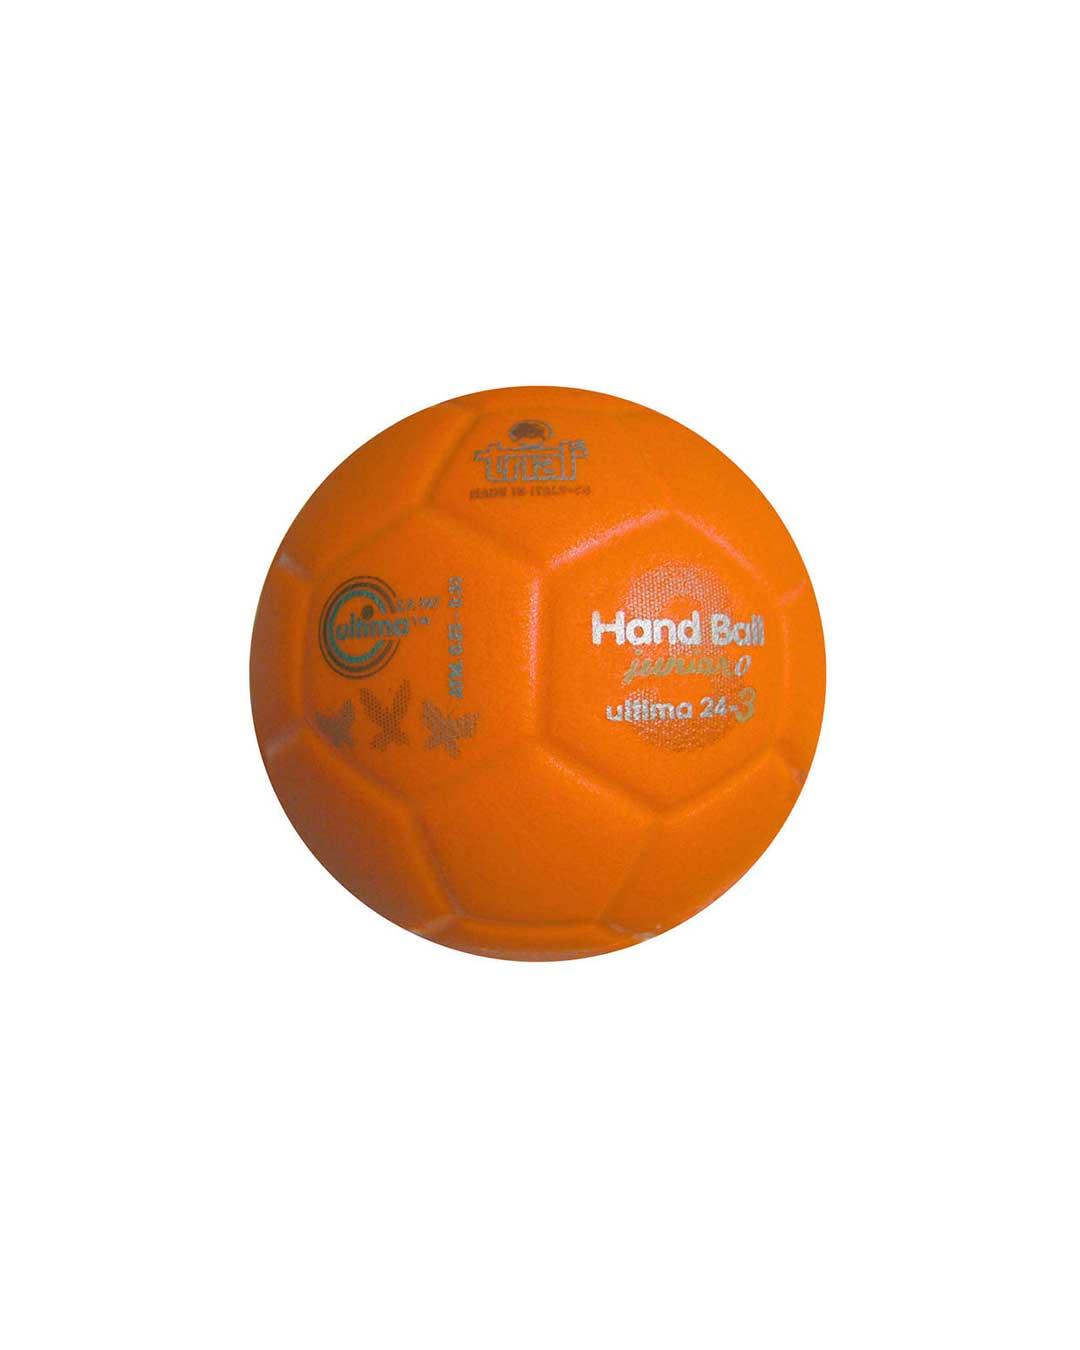 Balón de Handball Marca TRIAL Modelo Ultima 24-3 N° 0 naranja